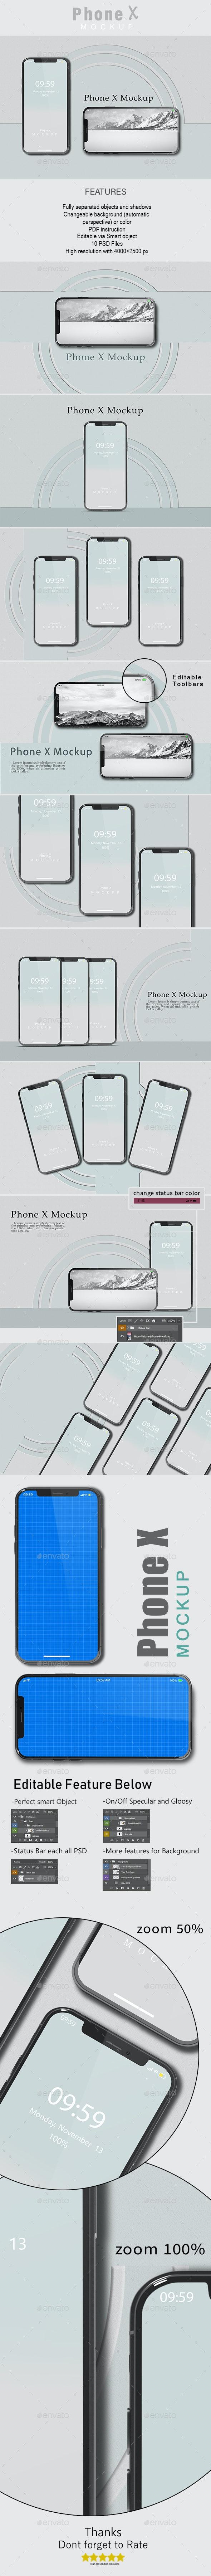 IPhone X Mockup - Mobile Displays